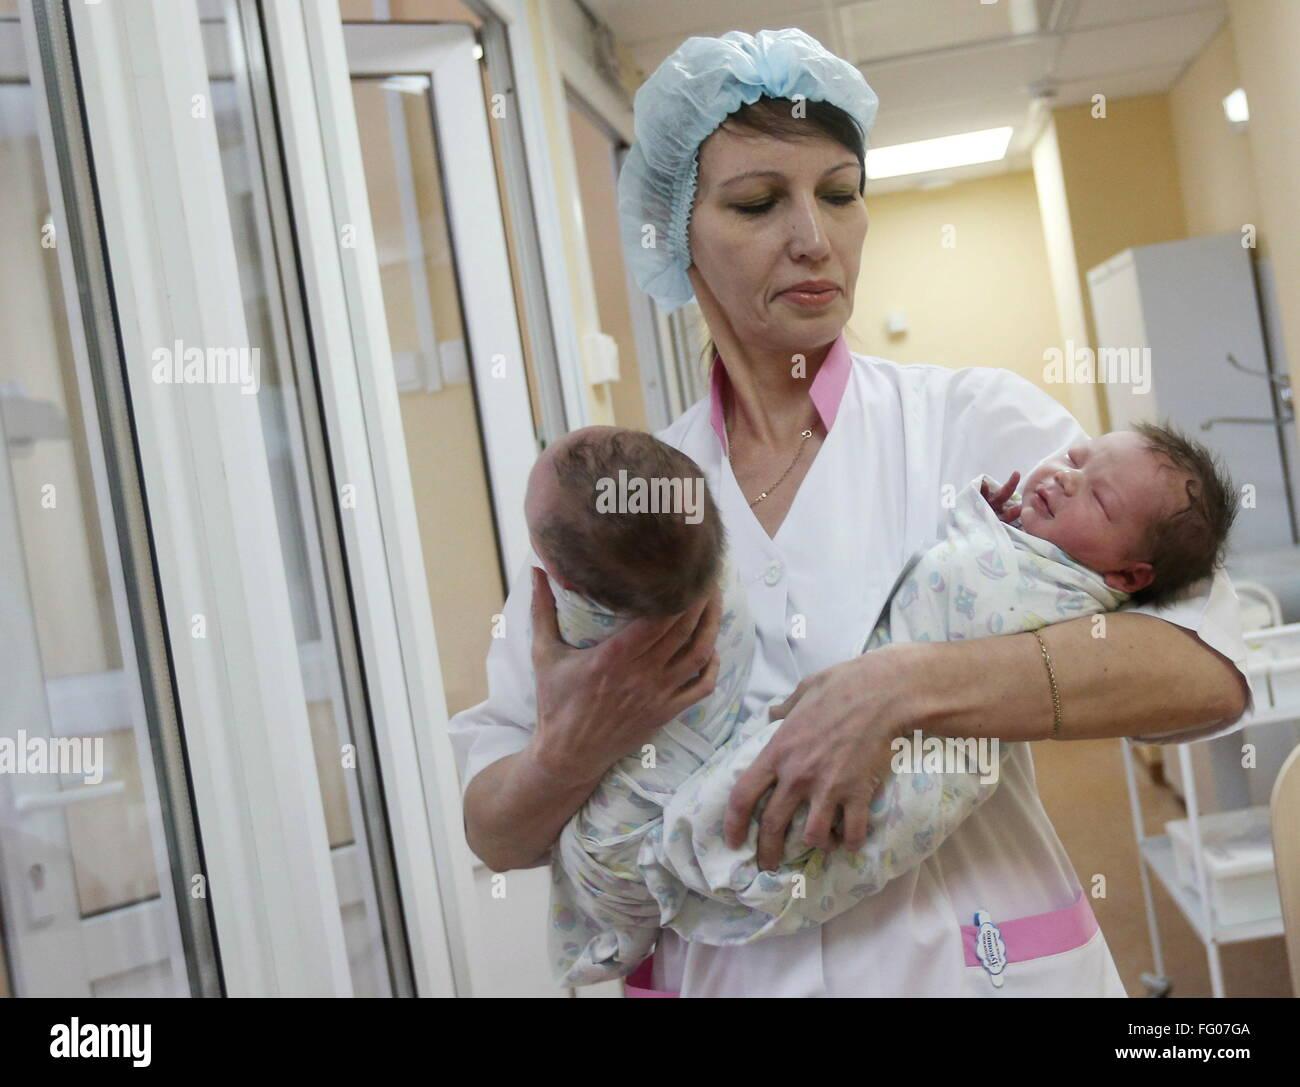 Crying Babies Hospital Stock Photos & Crying Babies